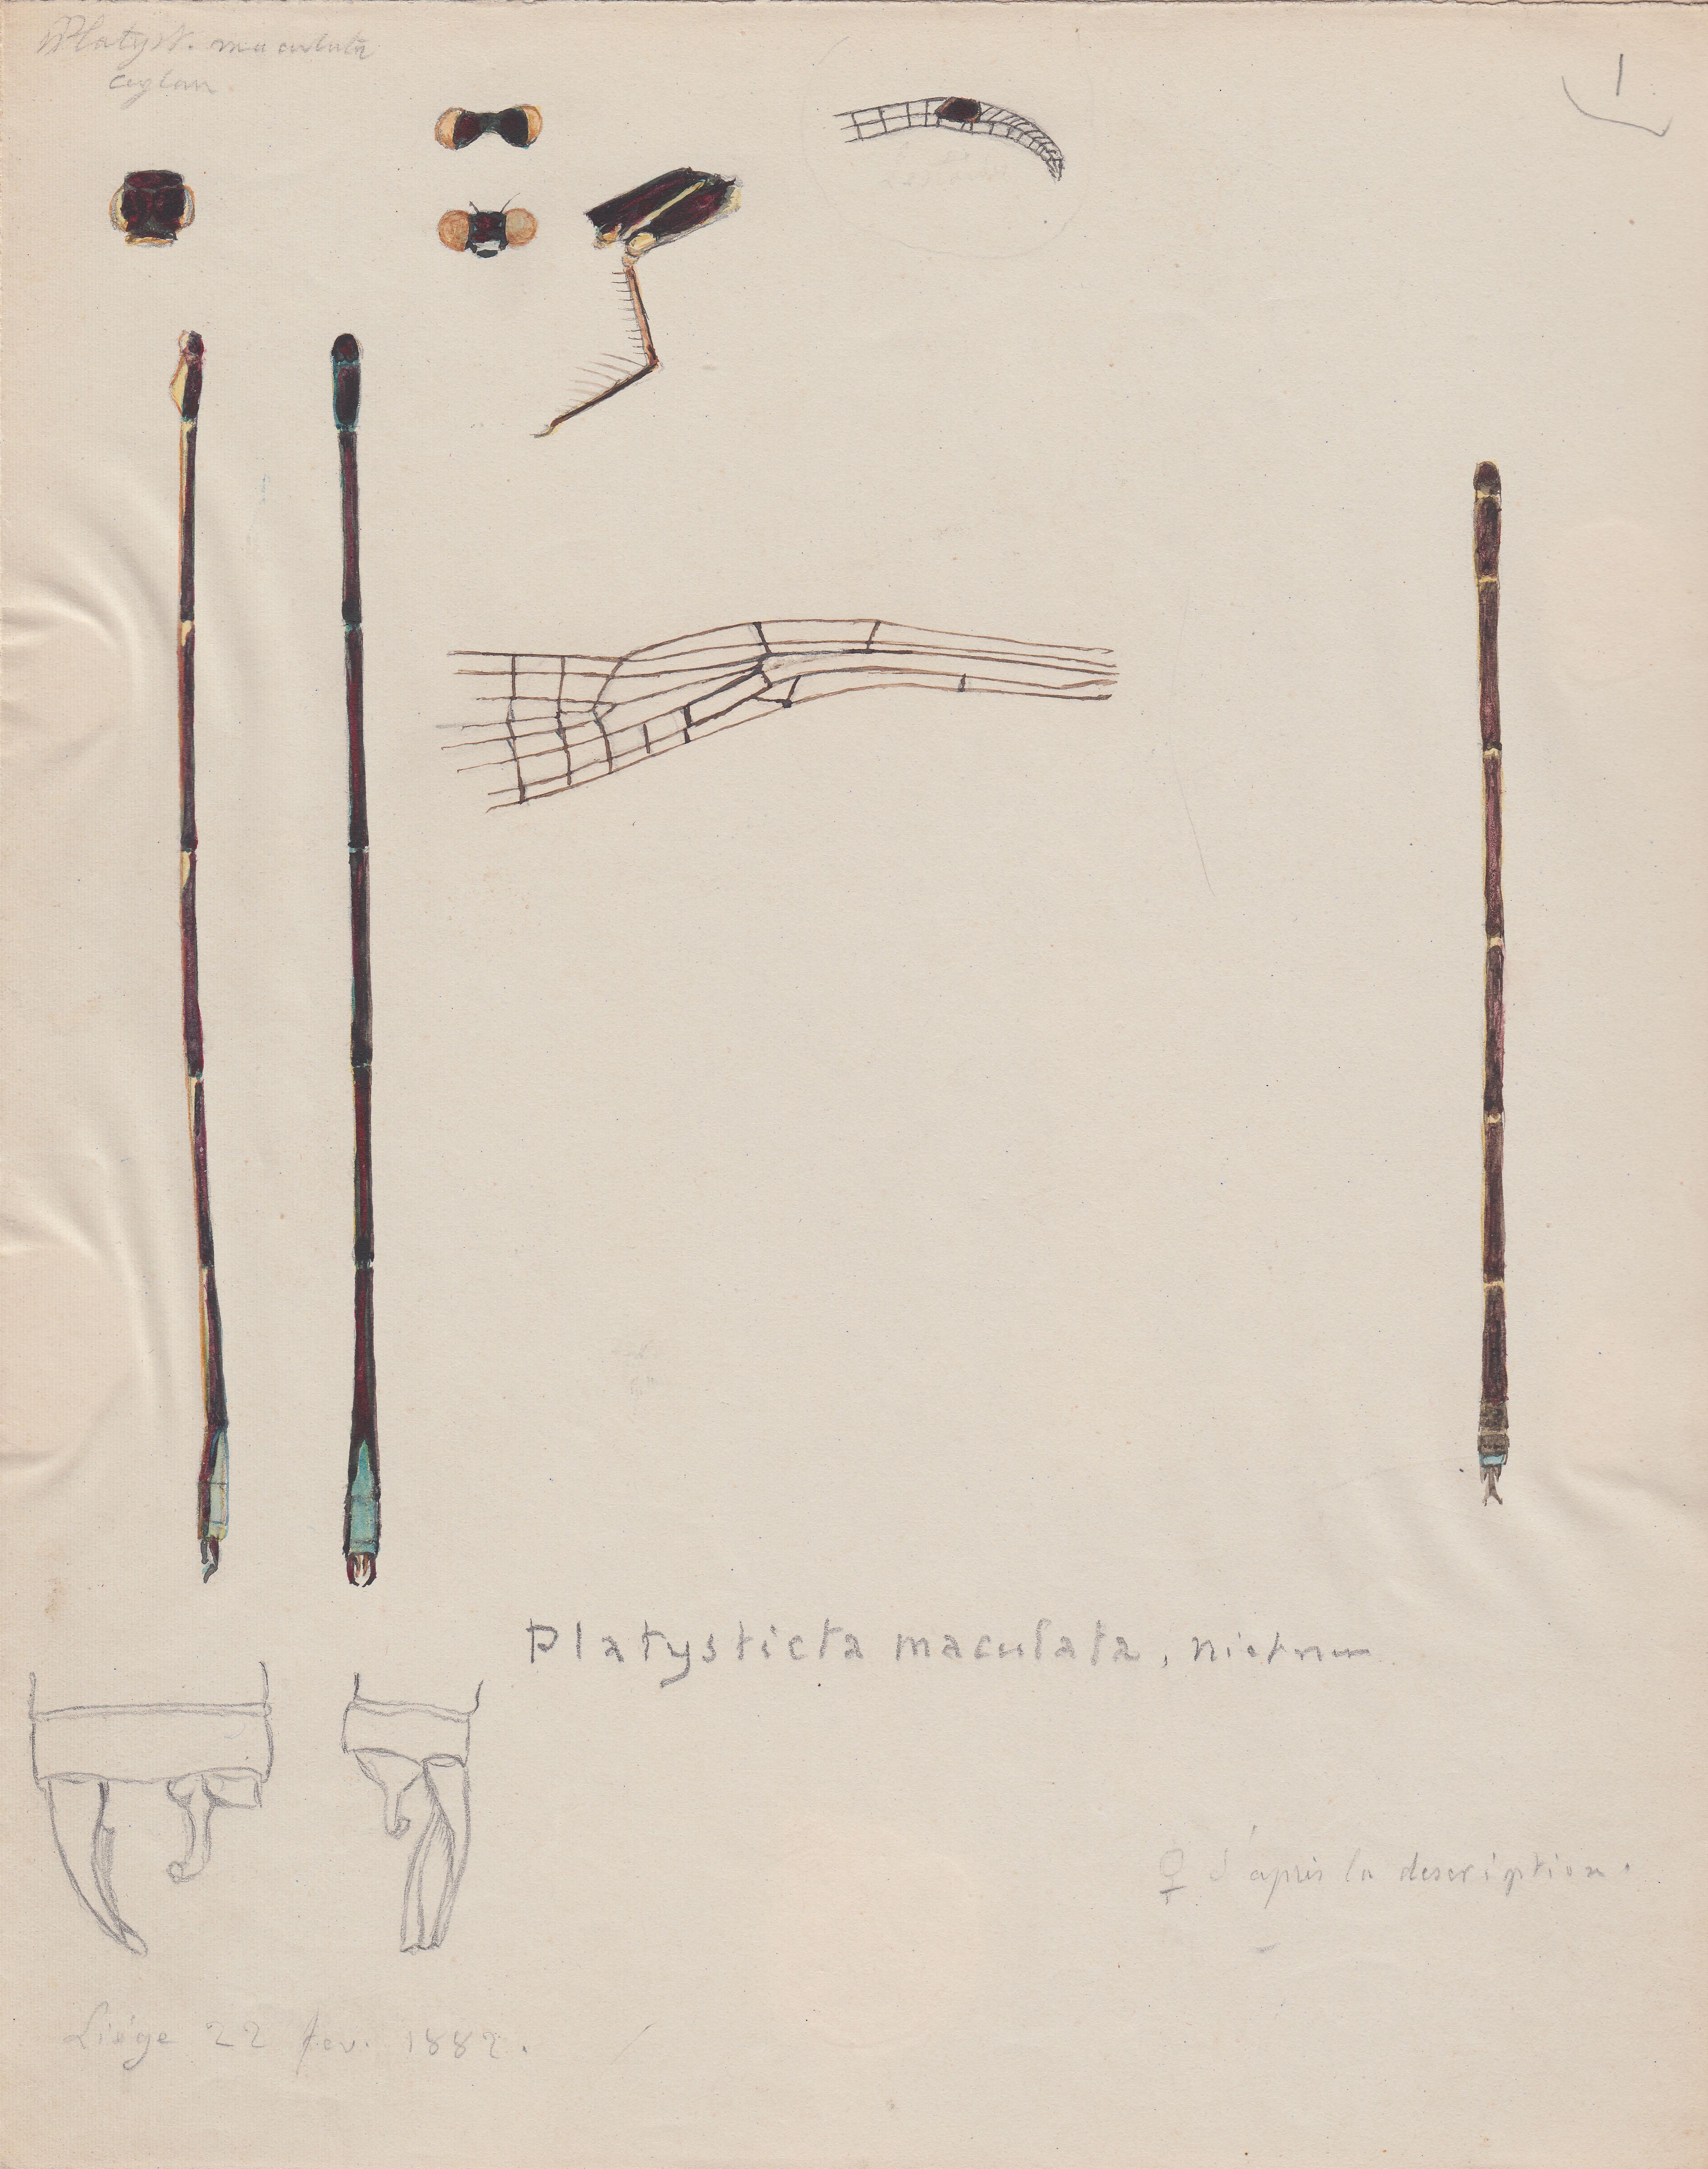 Platysticta maculata.jpg